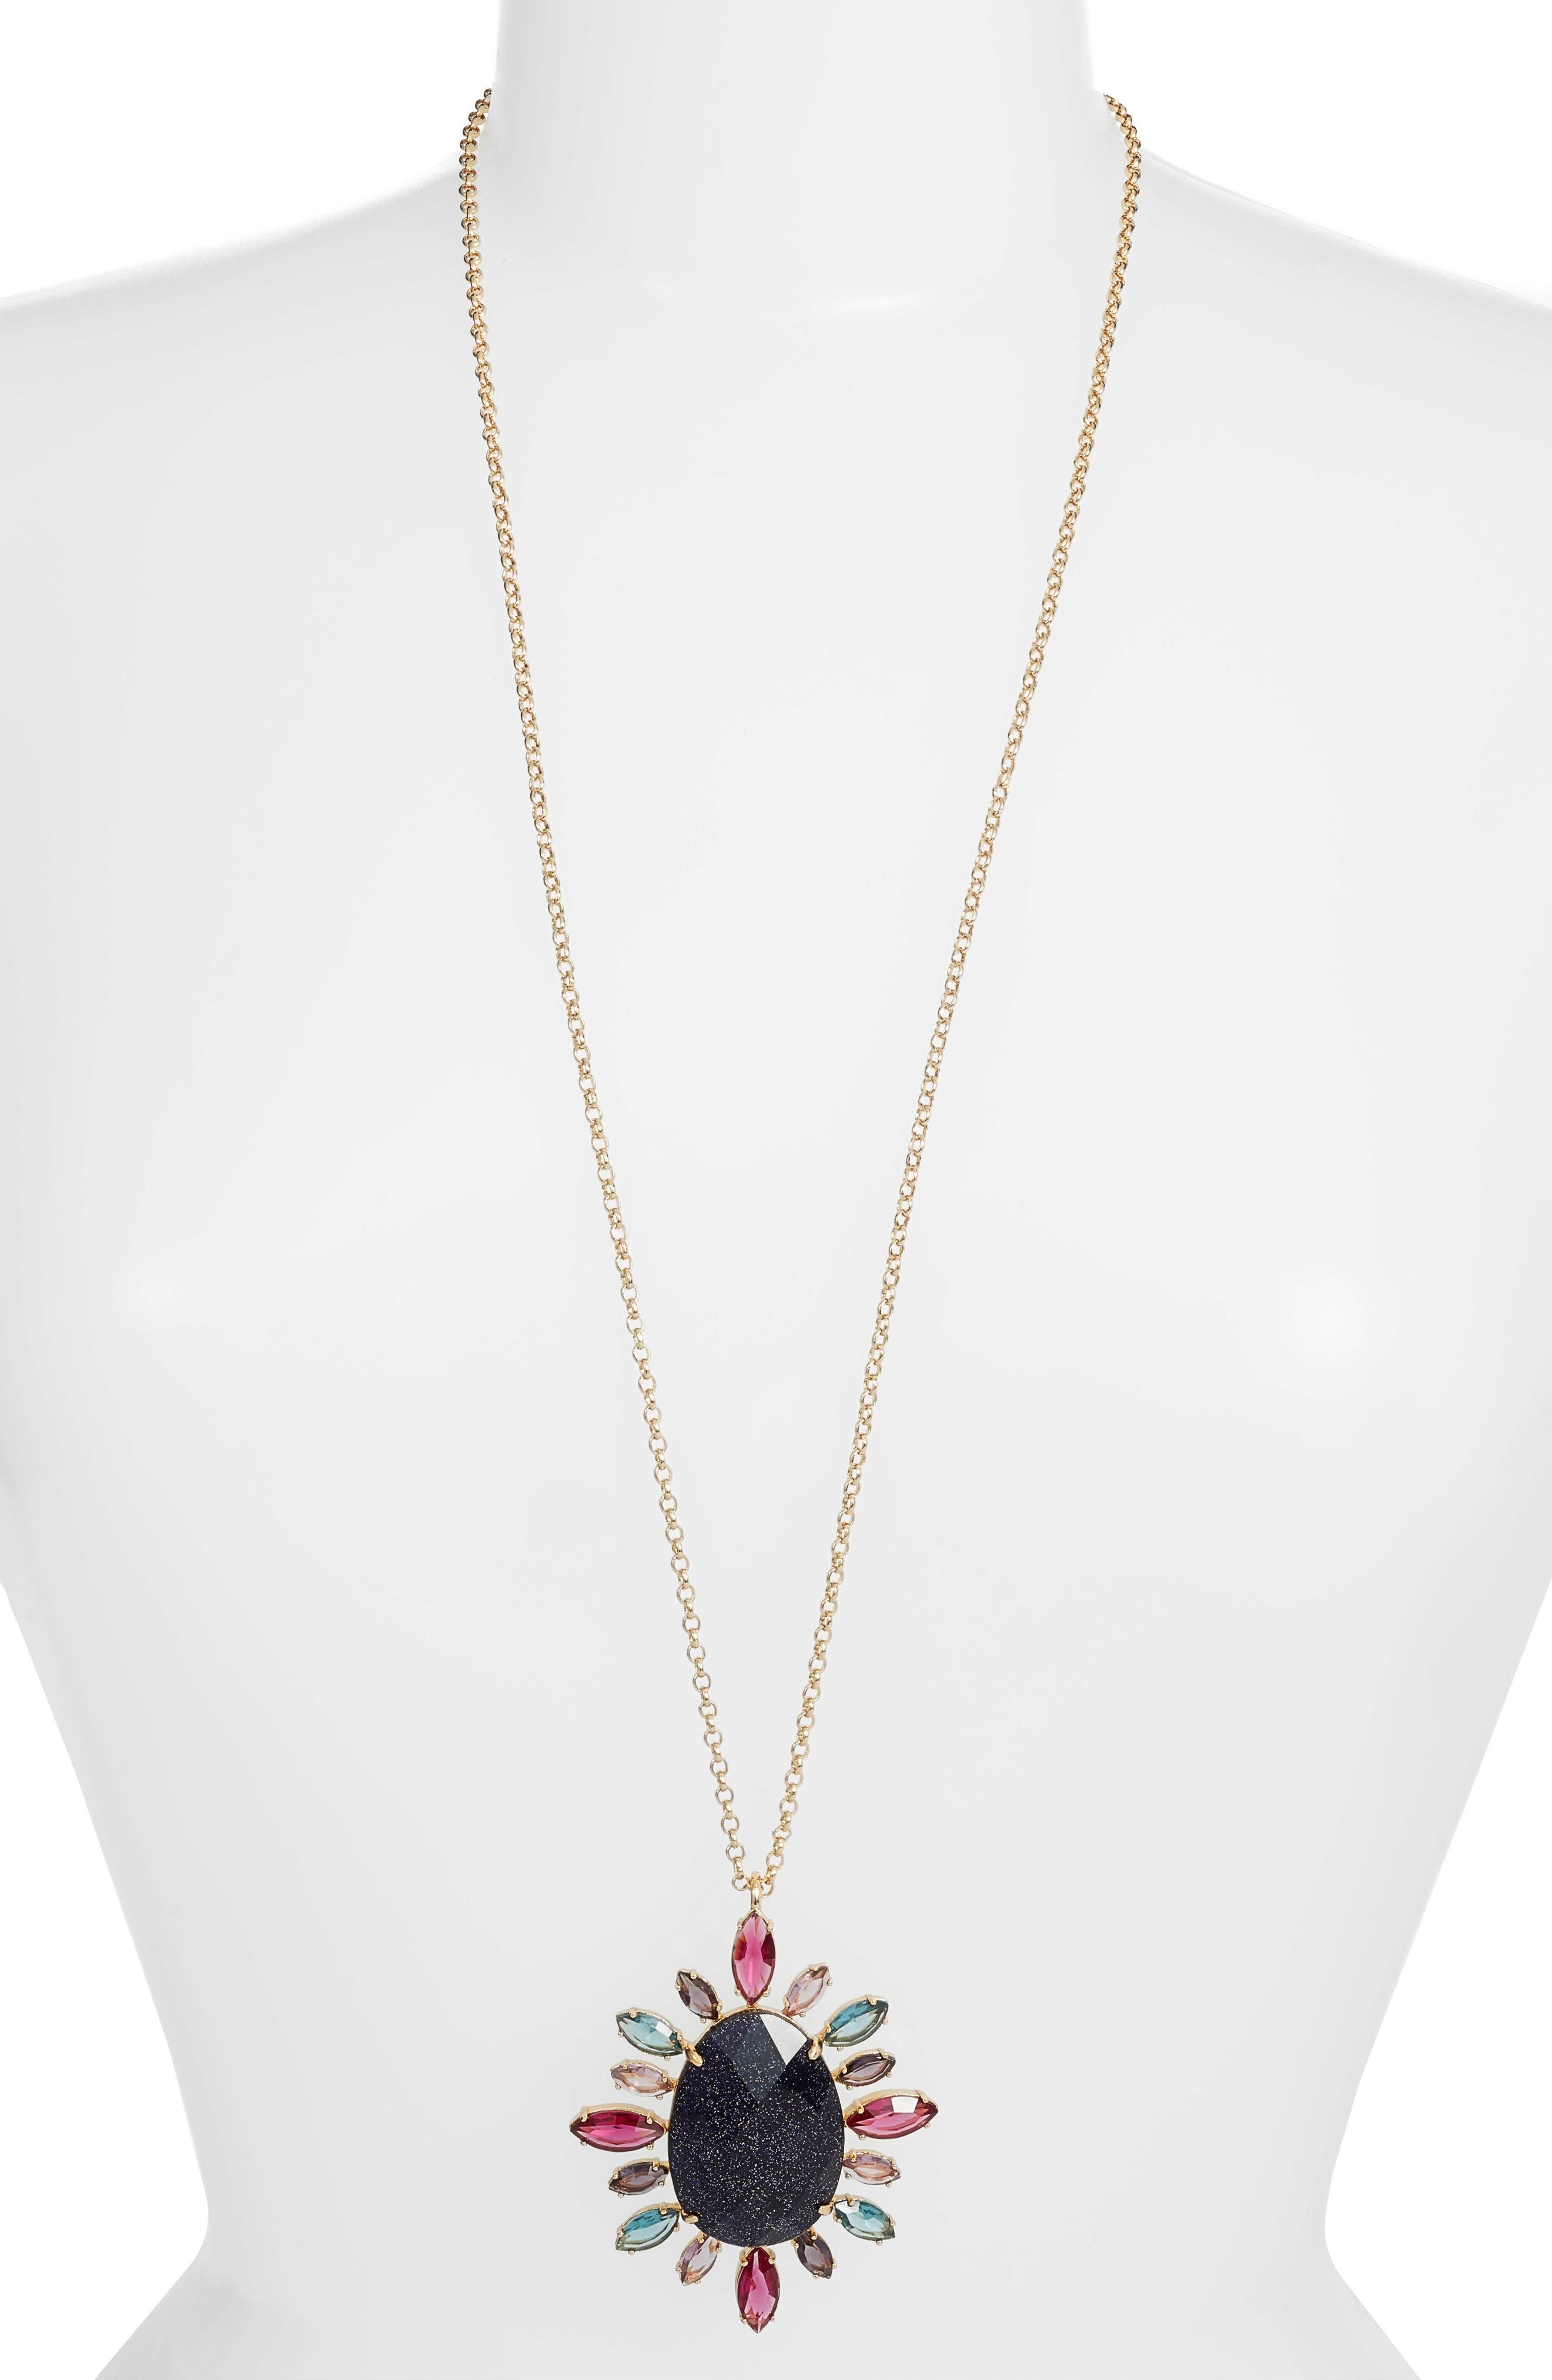 kate spade new york night sky pendant necklace